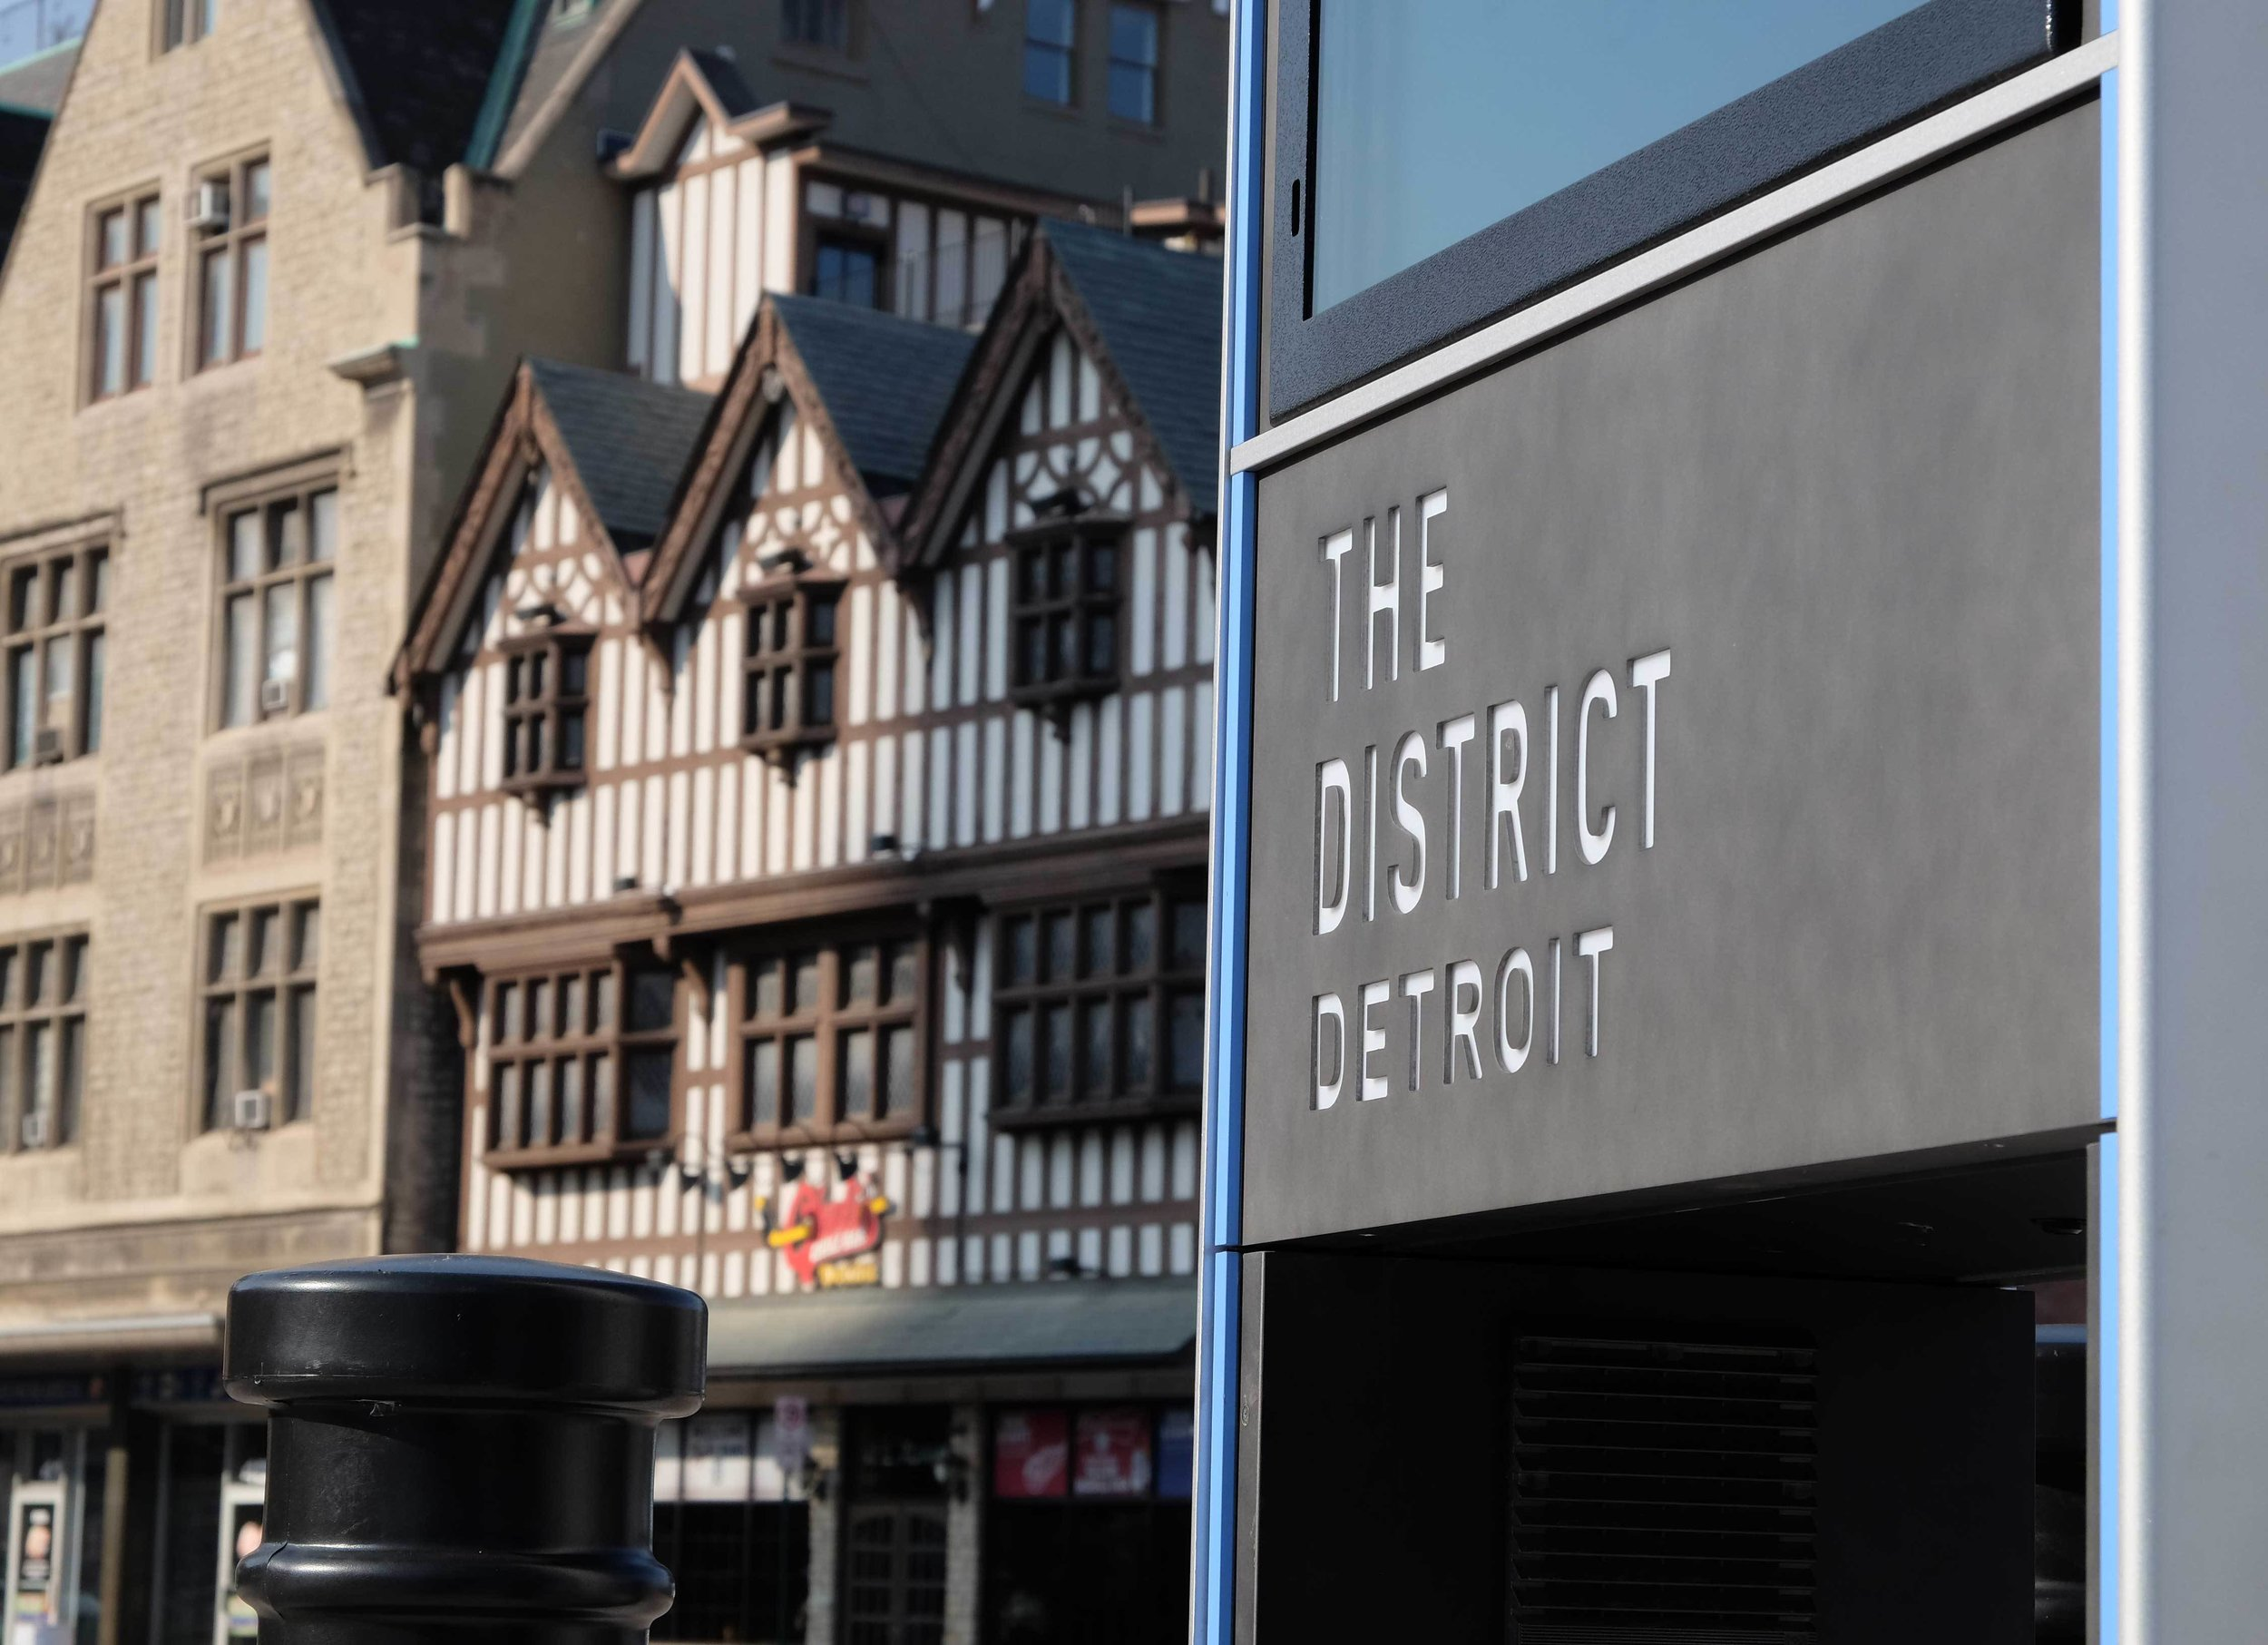 Detroit District Wayfinding Signage.jpg